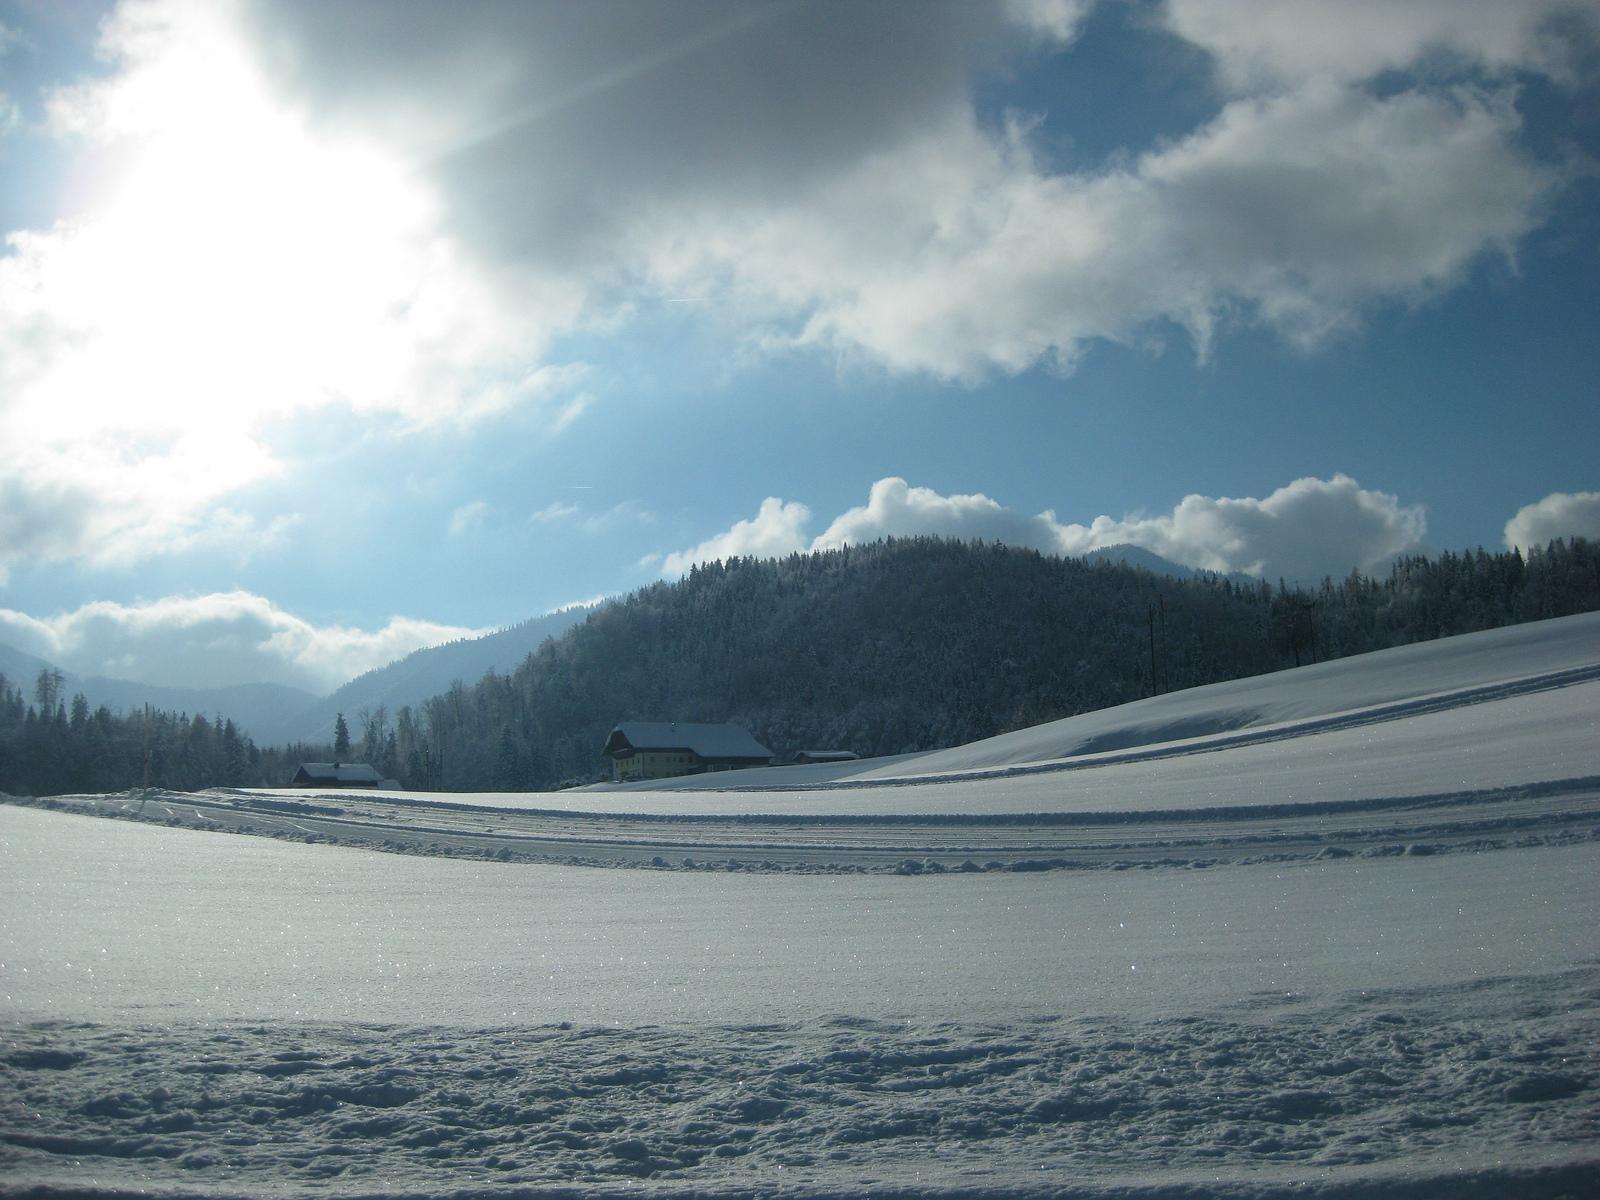 Lohnendes Ausflugsziel Faistenau (Foto: Tourismusverband Faistenau)